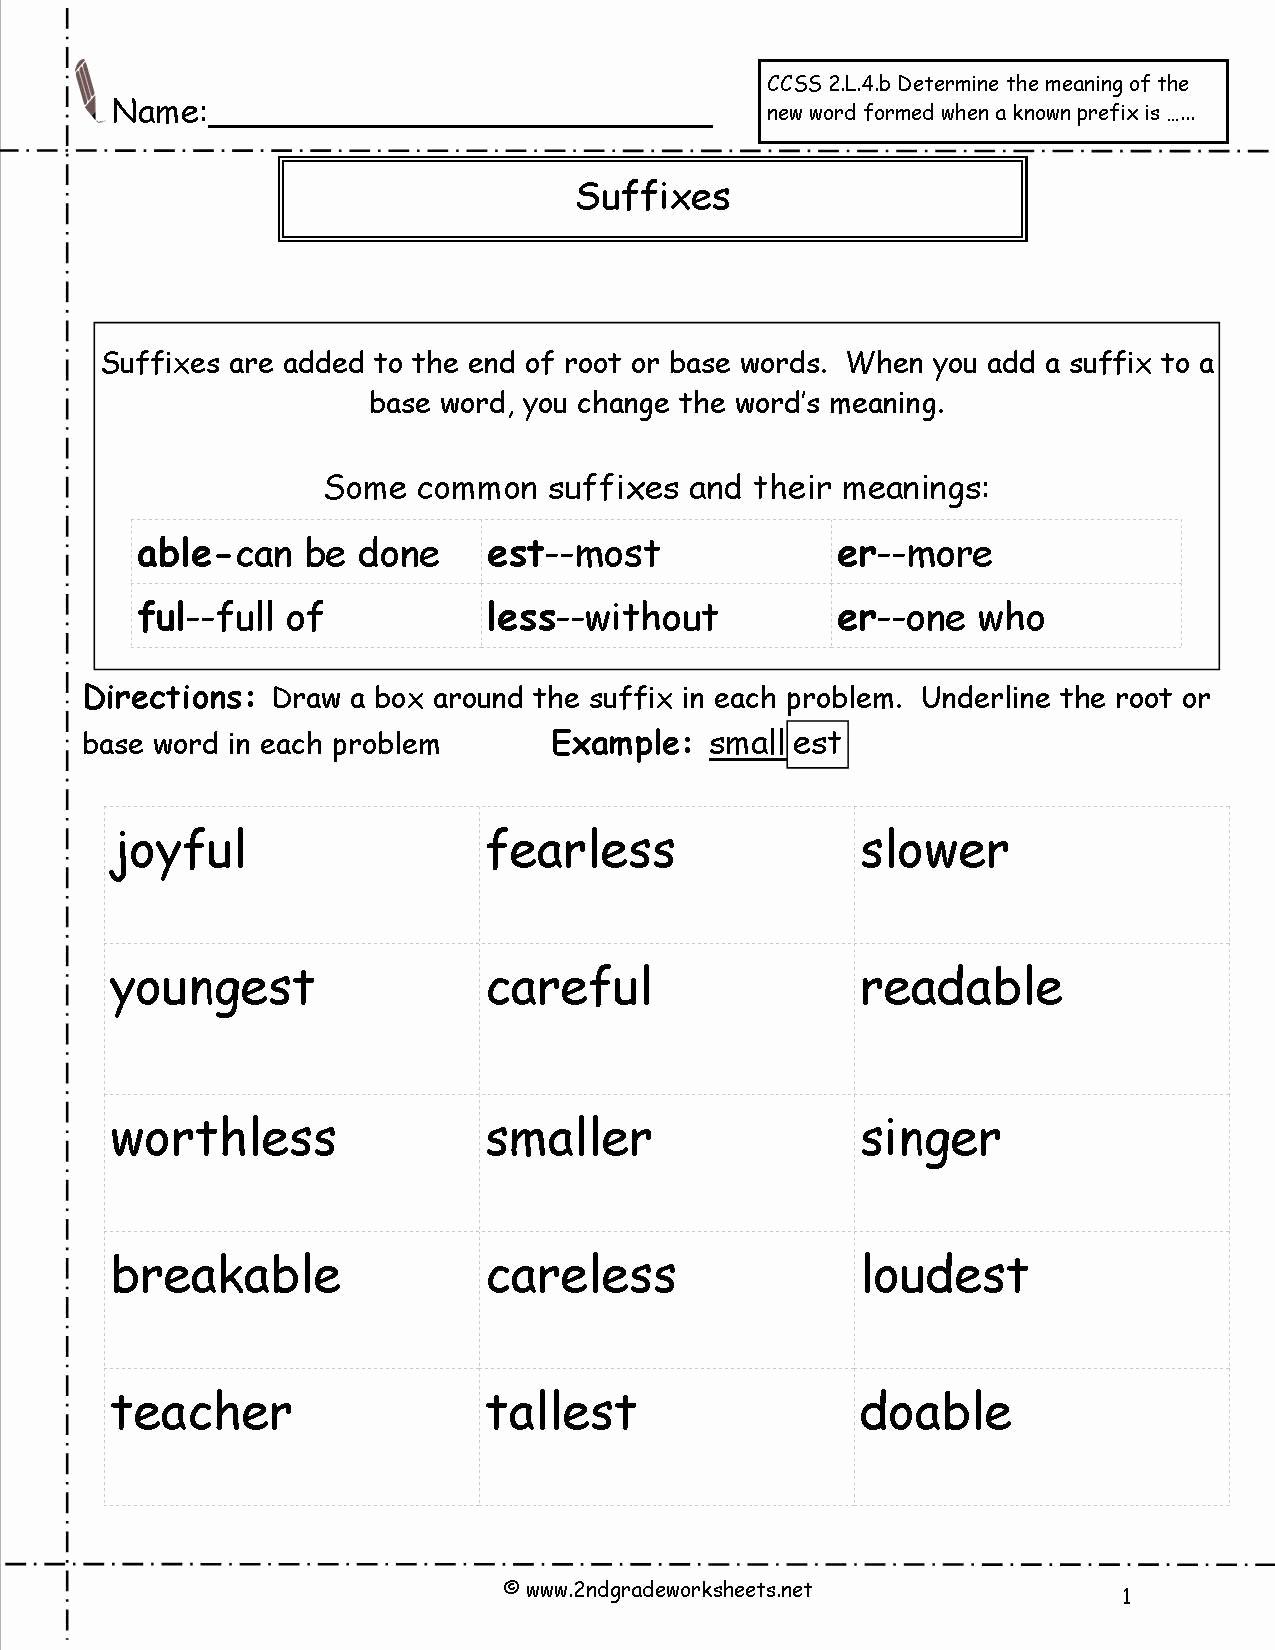 Prefix Suffix Worksheets 3rd Grade Luxury 20 Prefix Suffix Worksheet 3rd Grade